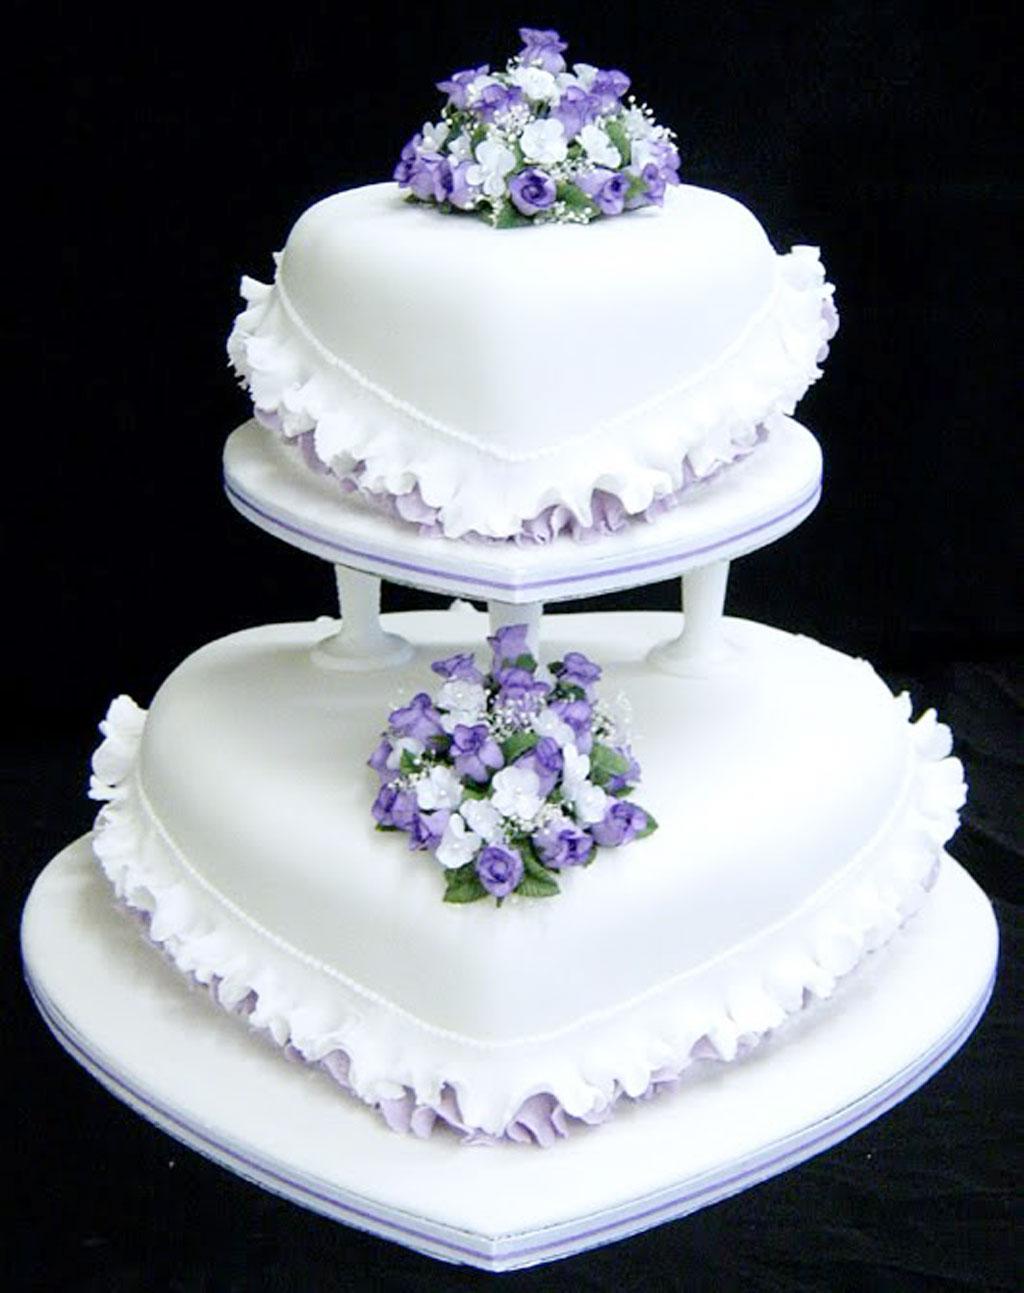 Regaling Purple Flower Heart Wedding Cake Wedding Cake Purple Flower Heart Wedding Cake Wedding Cake Cake Ideas By Purple Wedding Cakes Pinterest Purple Wedding Cake Decorations wedding cake Purple Wedding Cakes